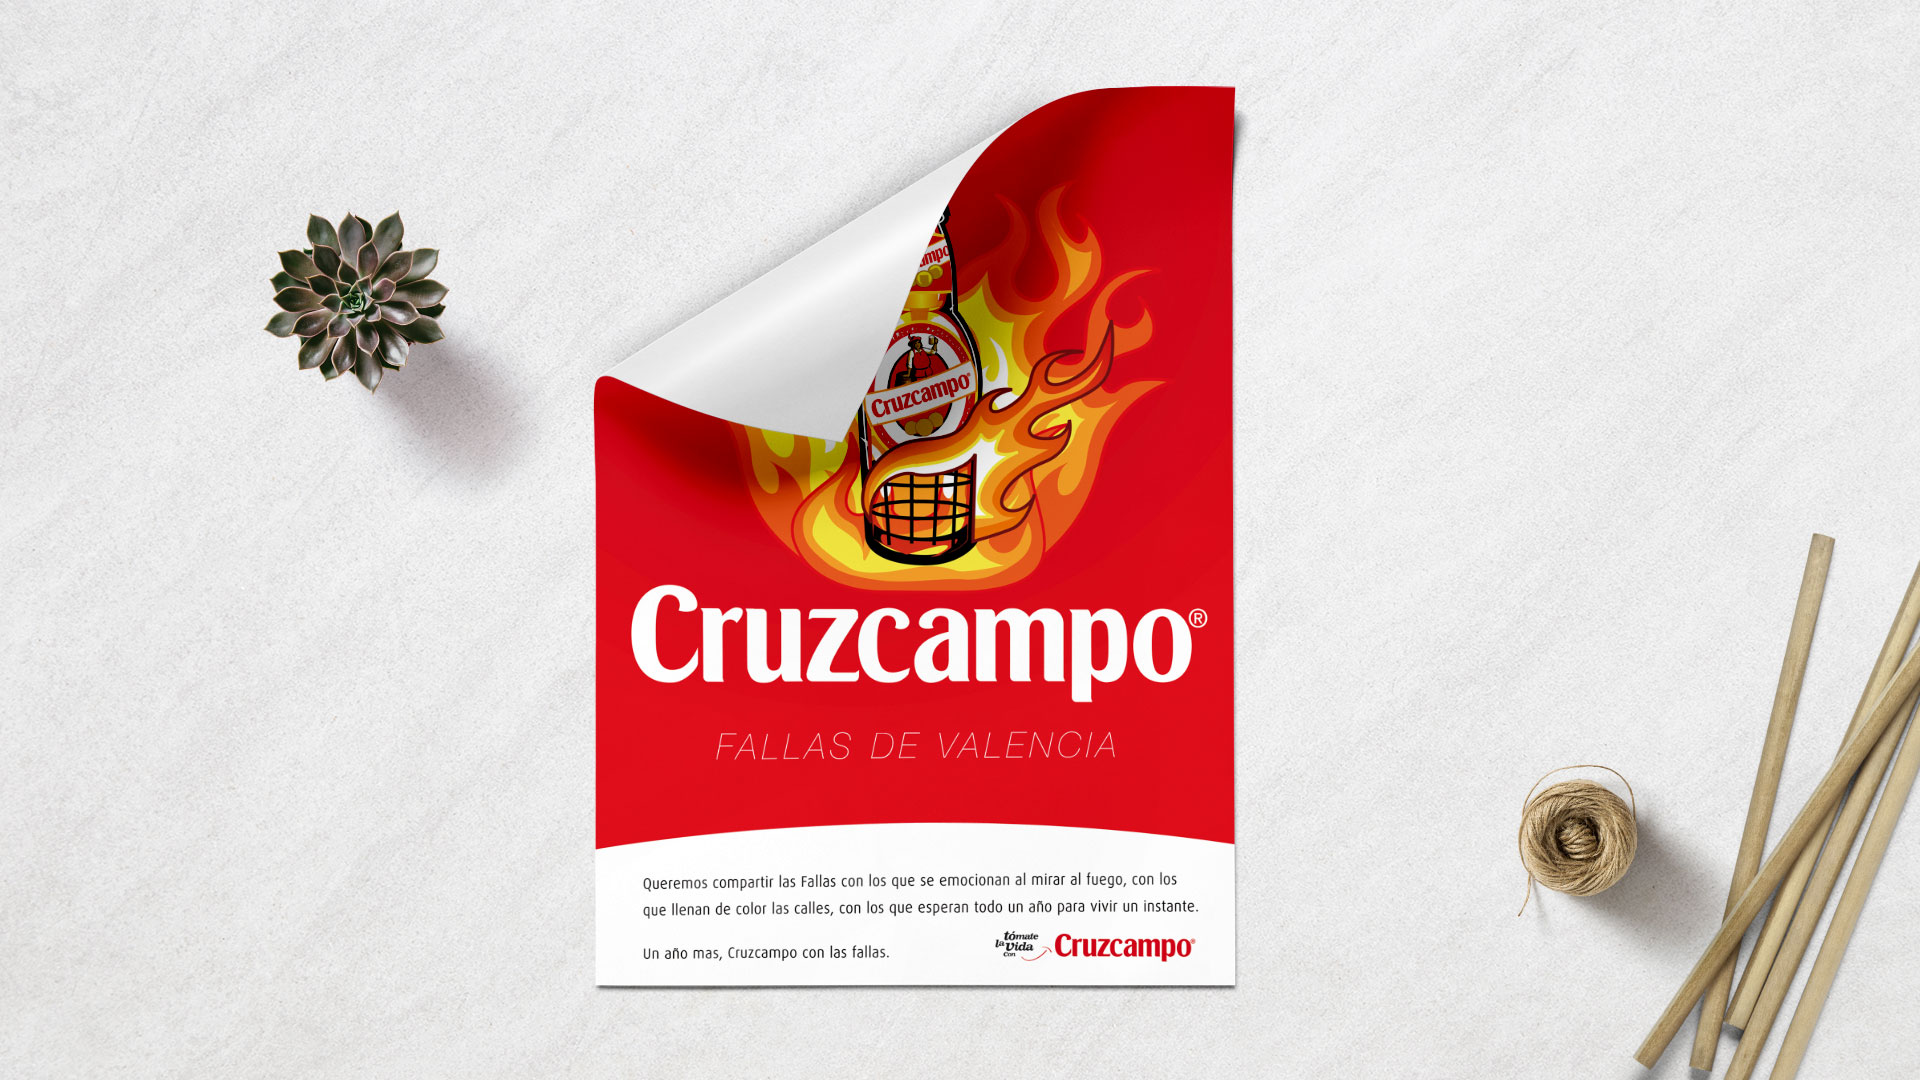 1aa_advertising_design_graphic_cruzcampo_fallas